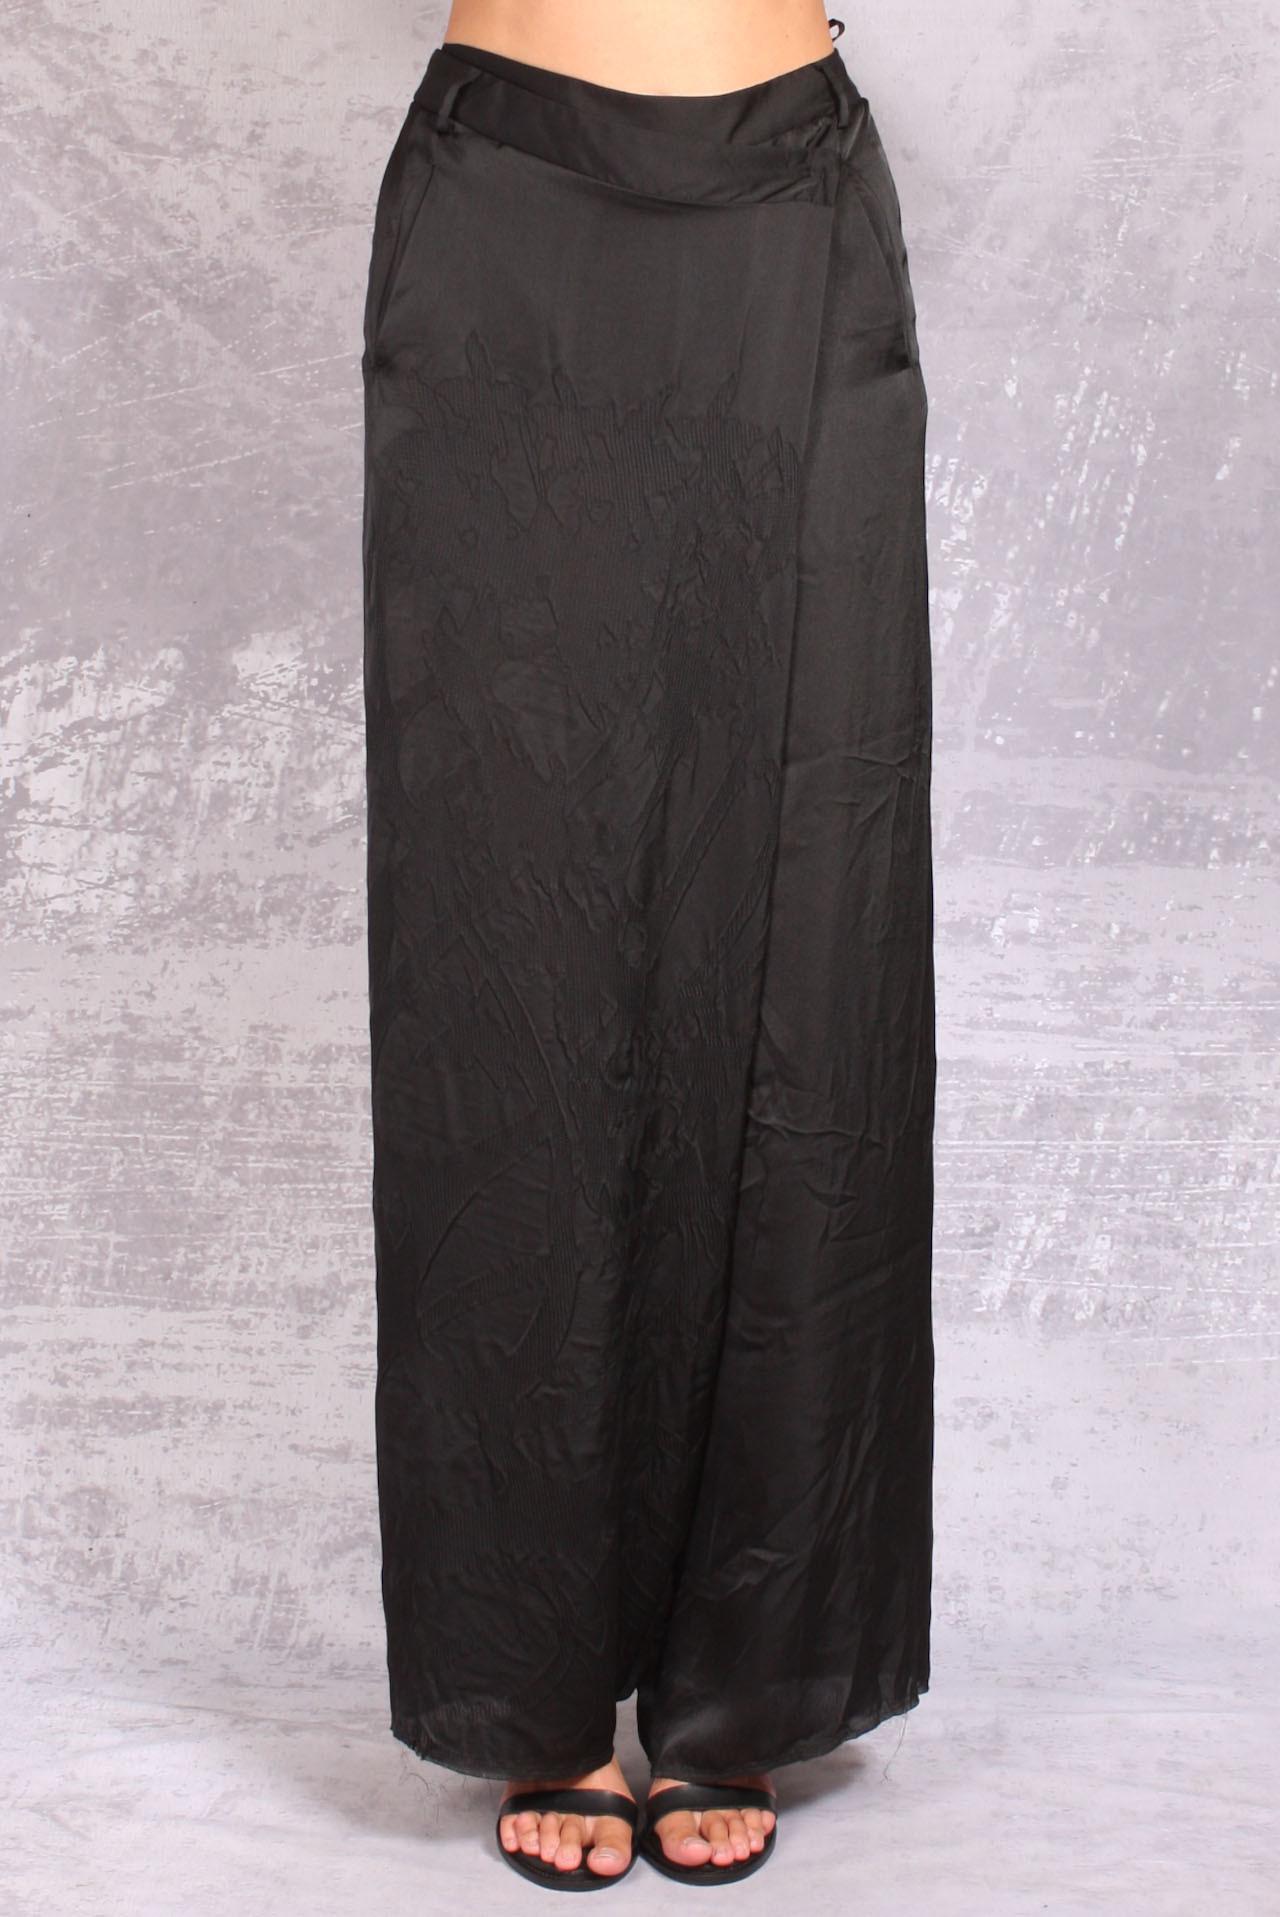 Masnada skirt pants